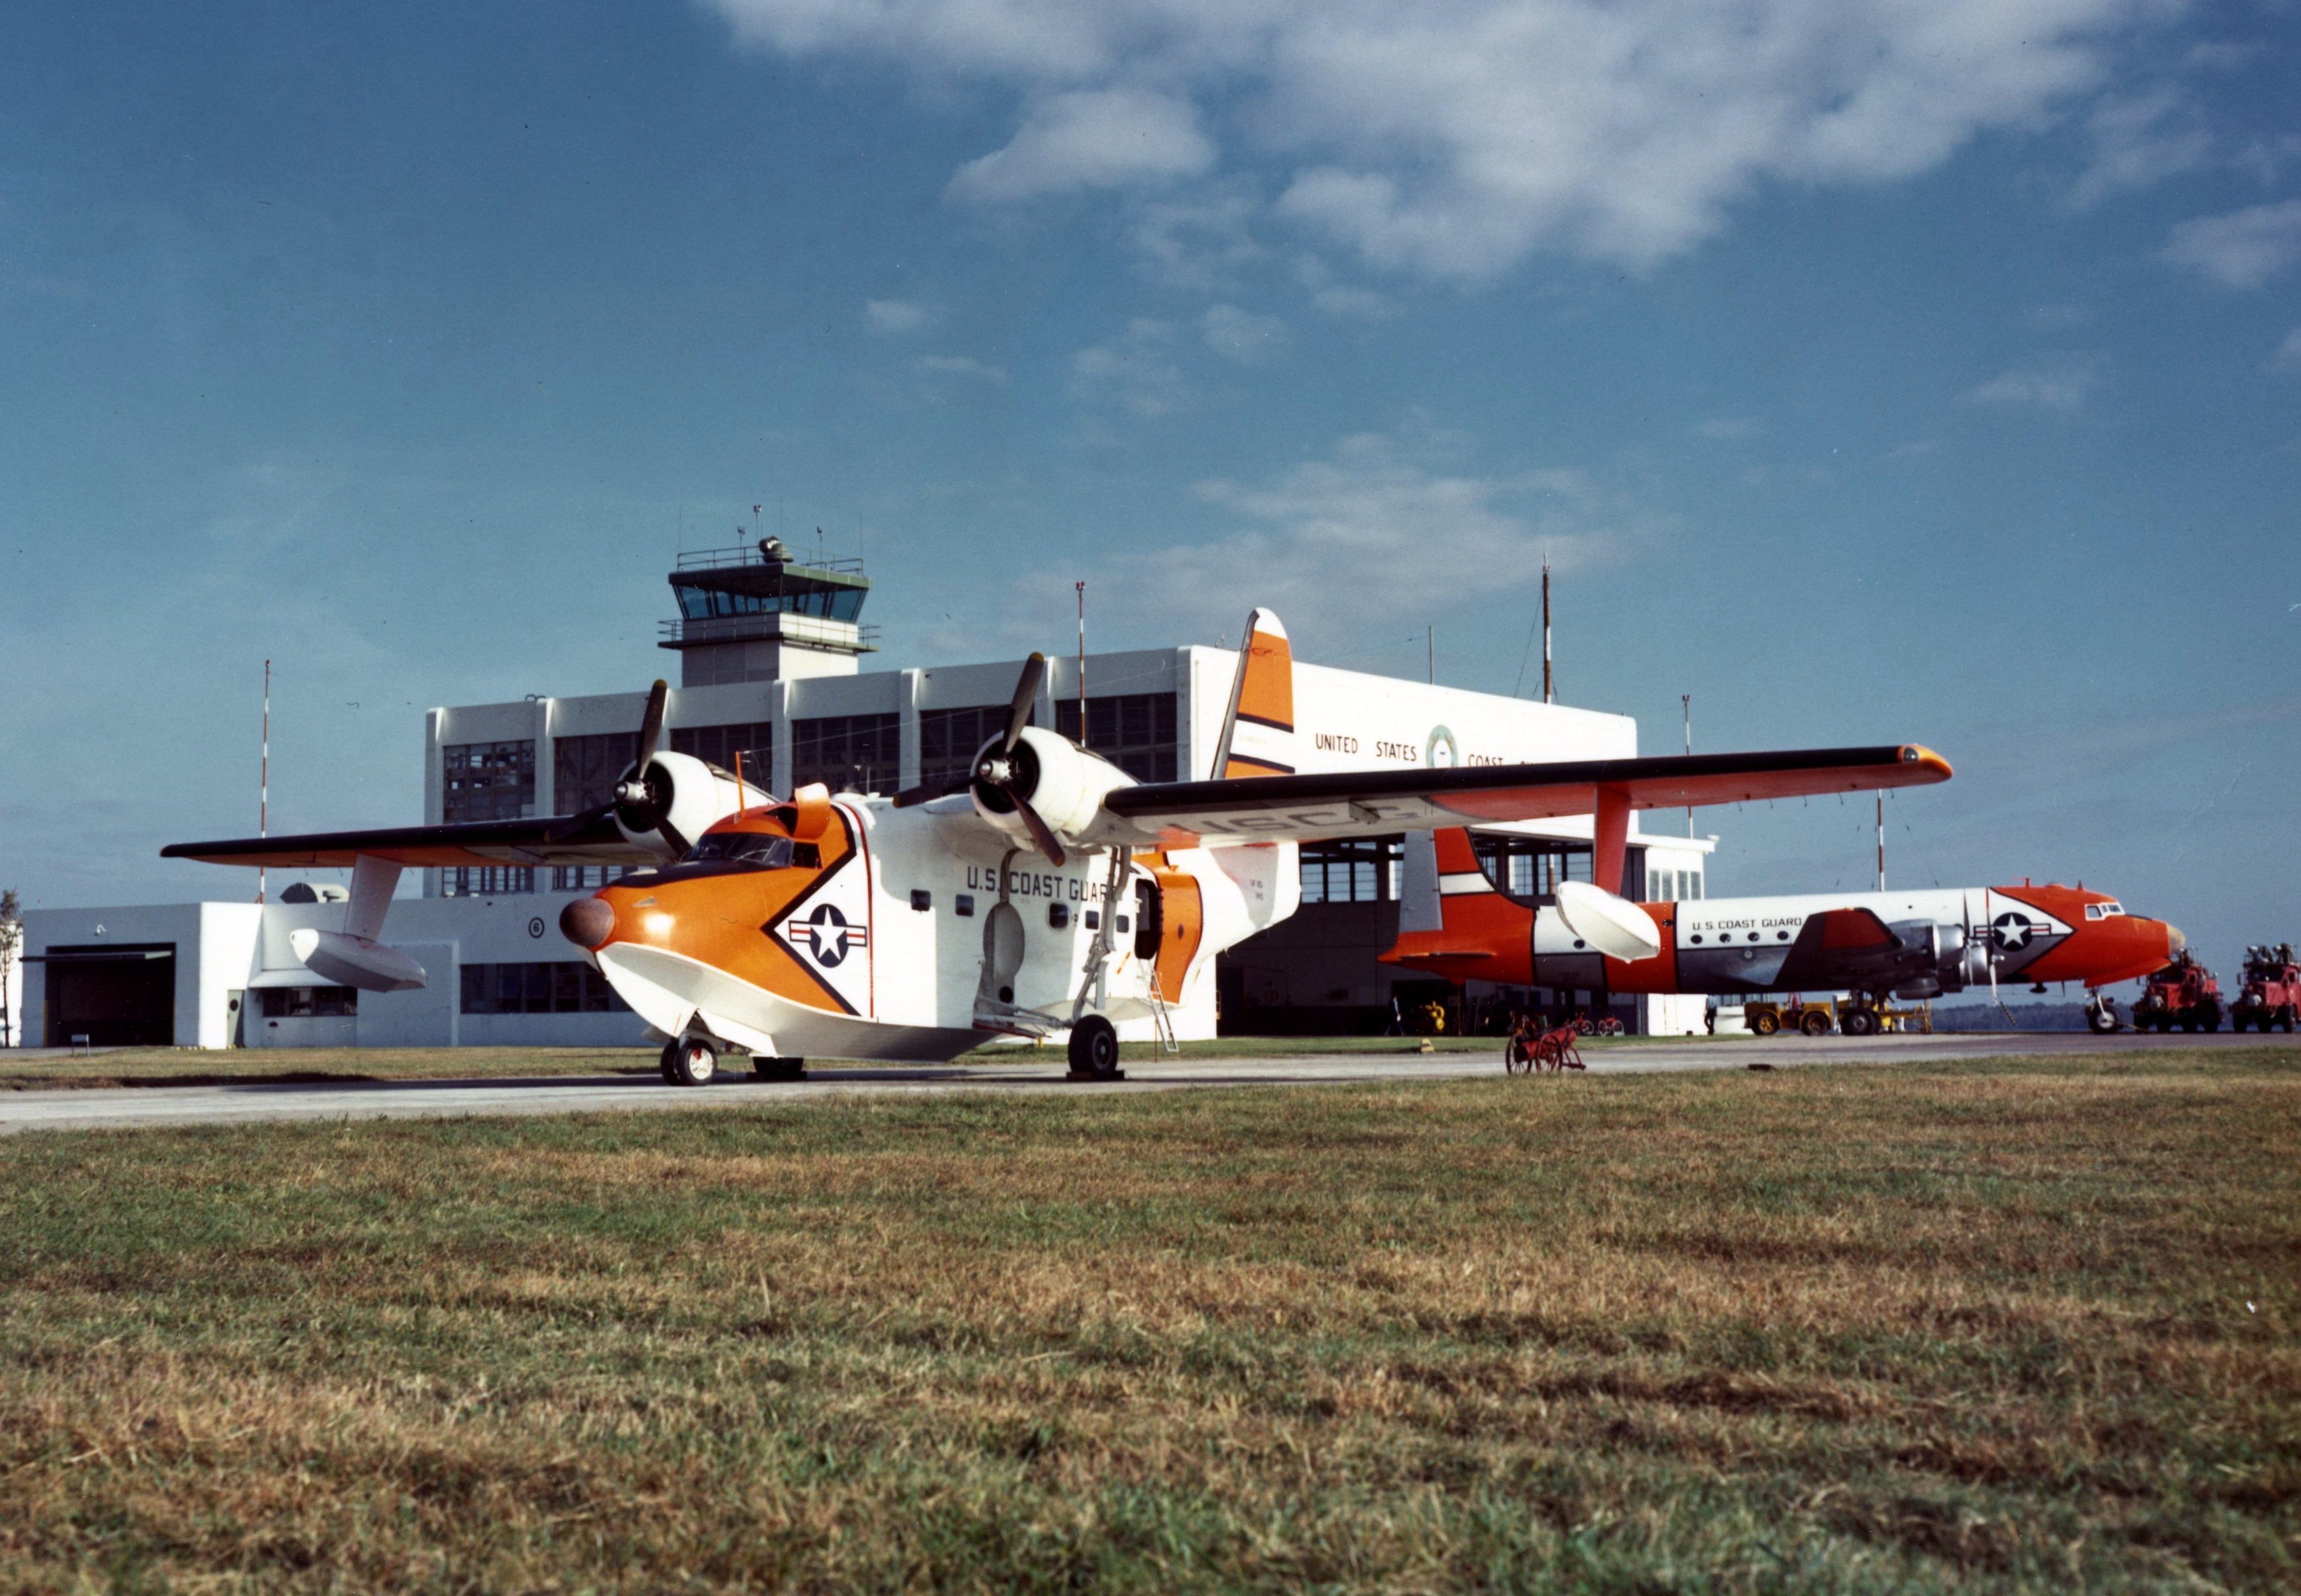 File:USCG UF-2G at CGAS Elizabeth City 1950s.jpg - Wikimedia Commonselizabeth city city